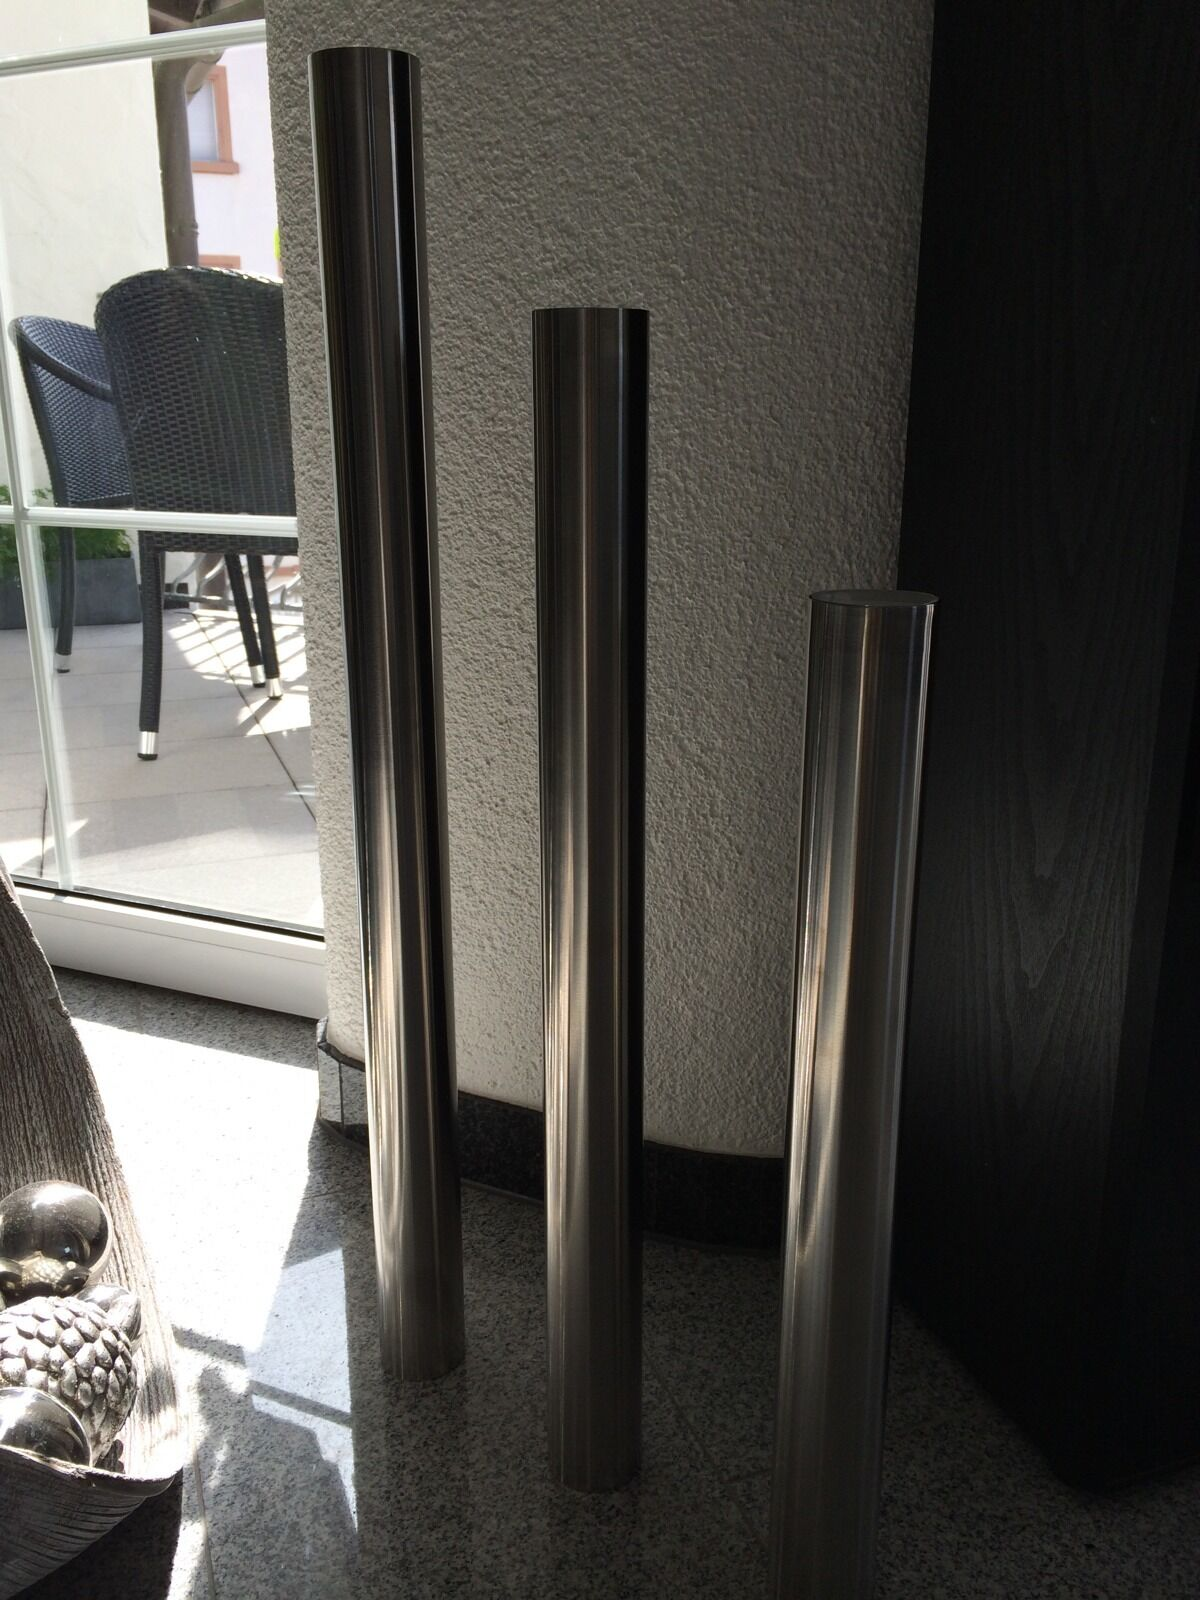 Design Kerzenständer Edelstahl poliert glänzend 66 cm